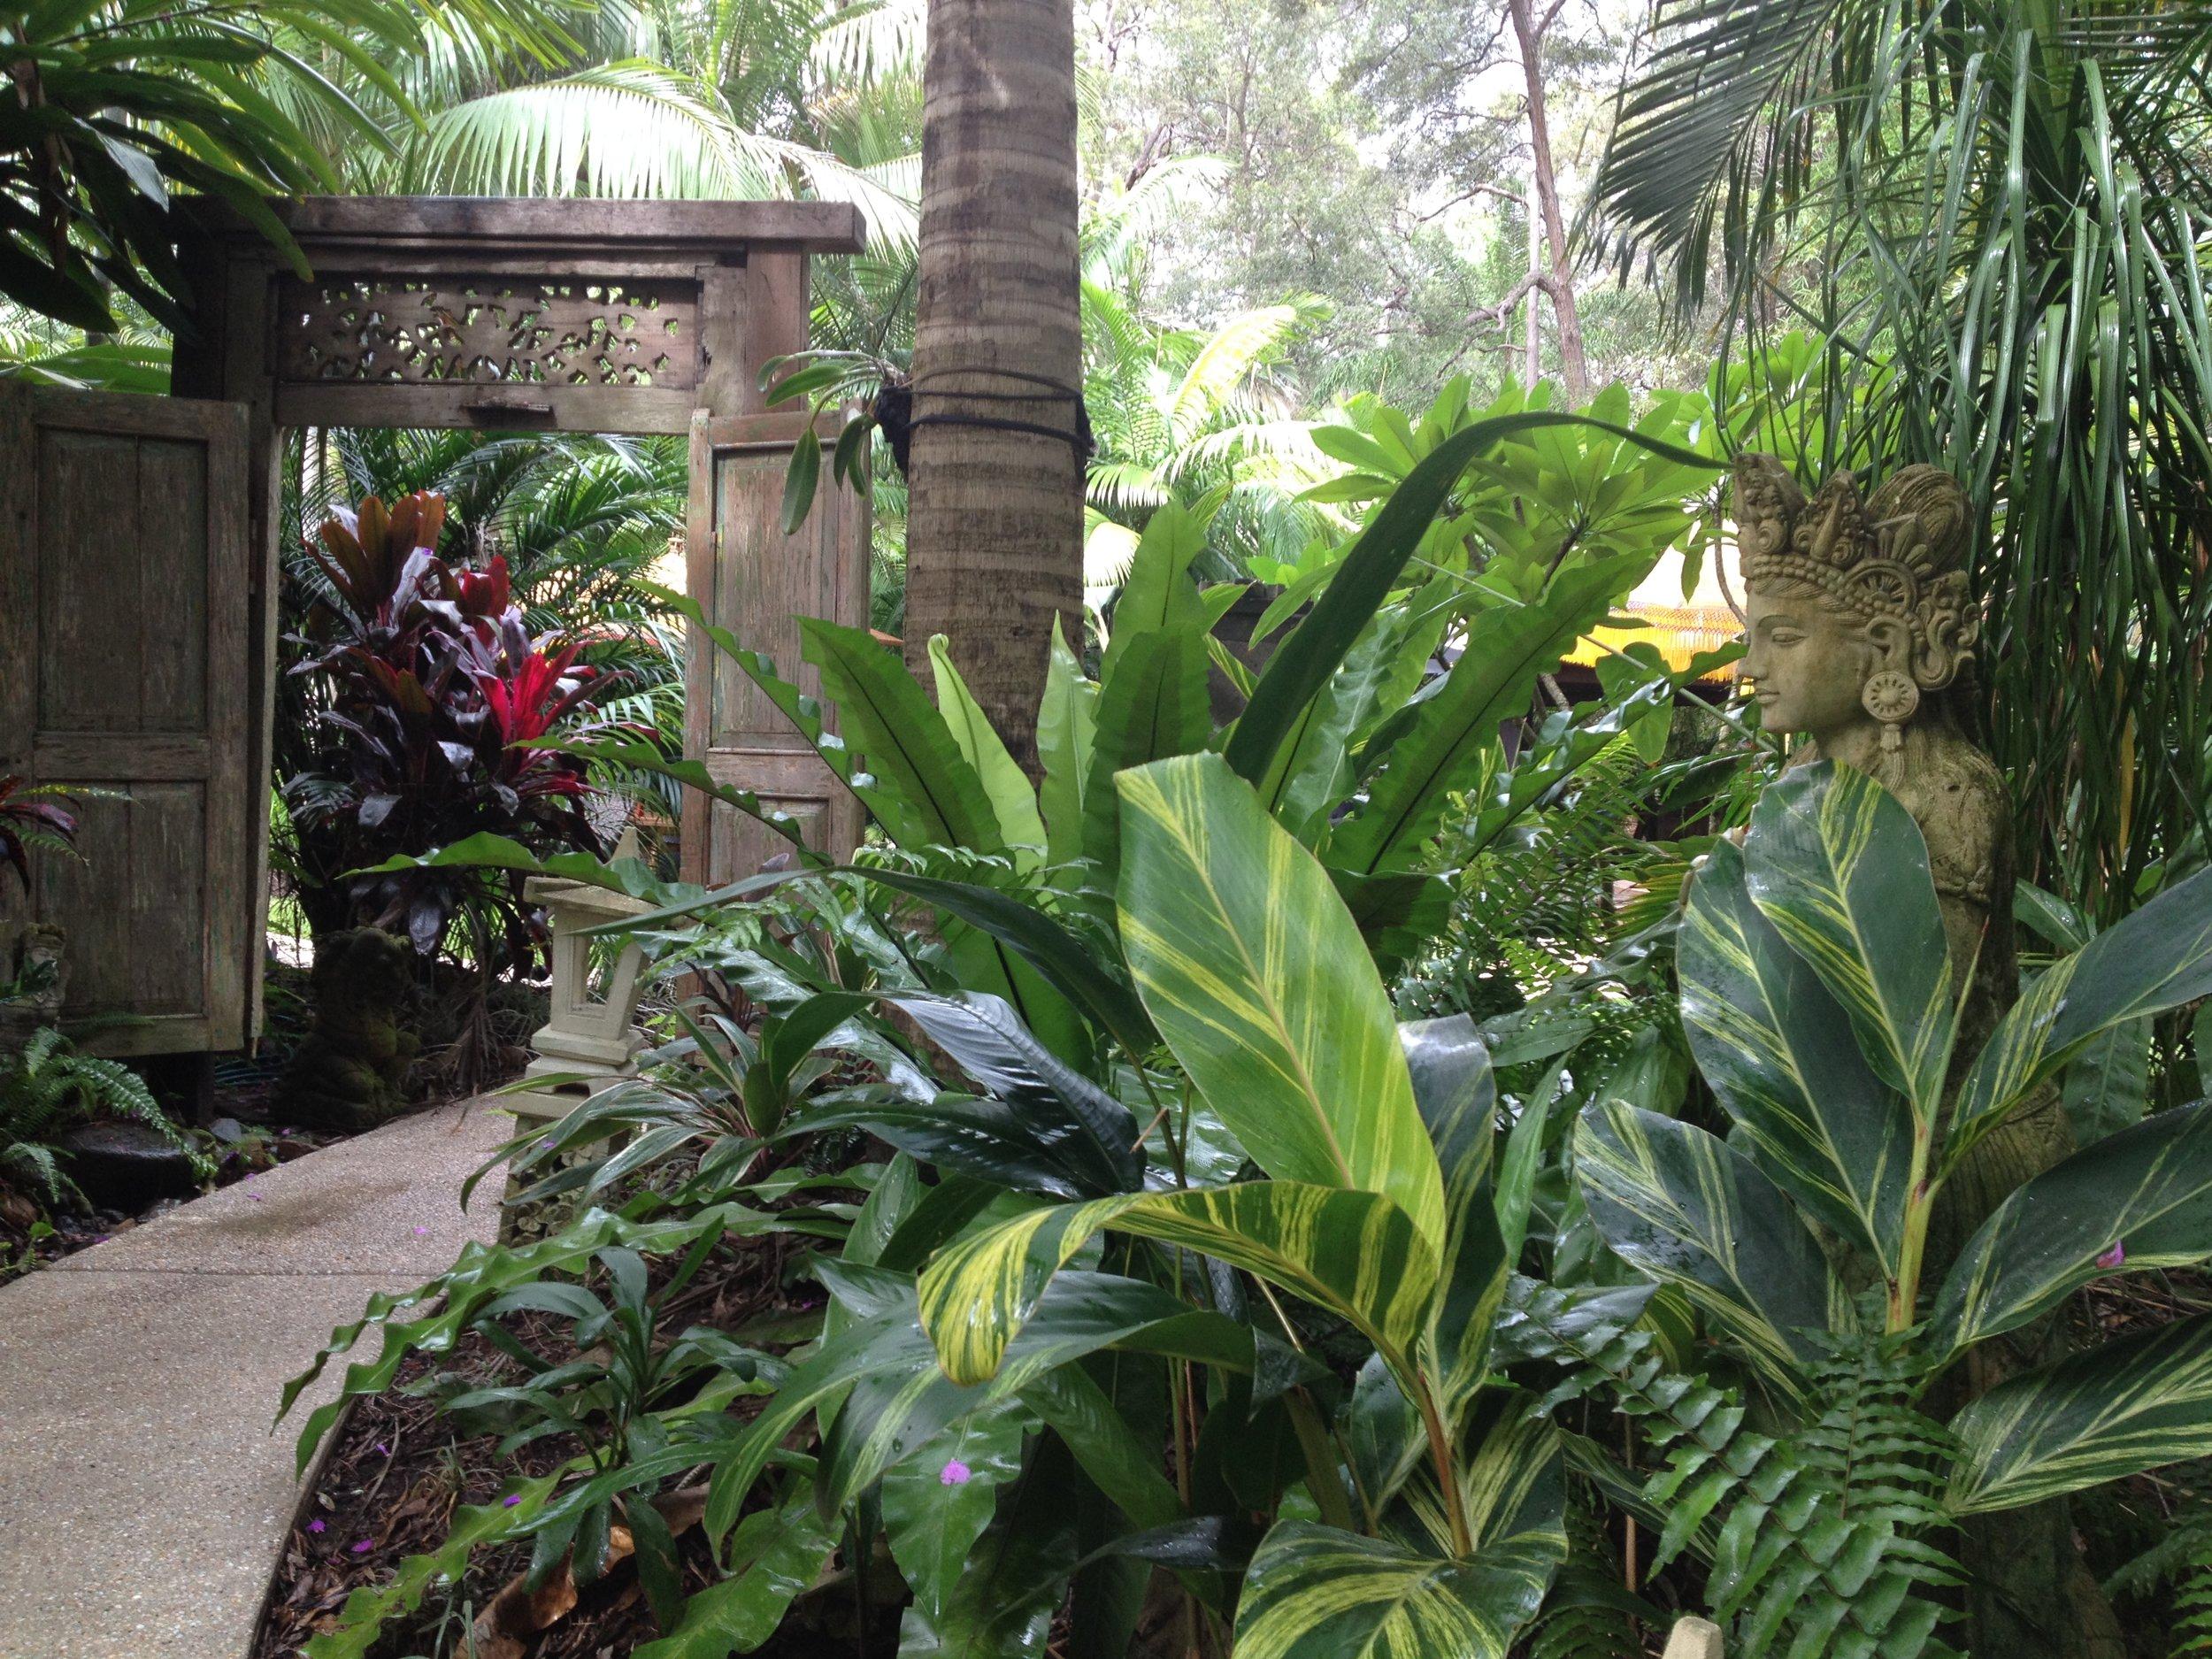 ikatan-gardengate copyHR.JPG